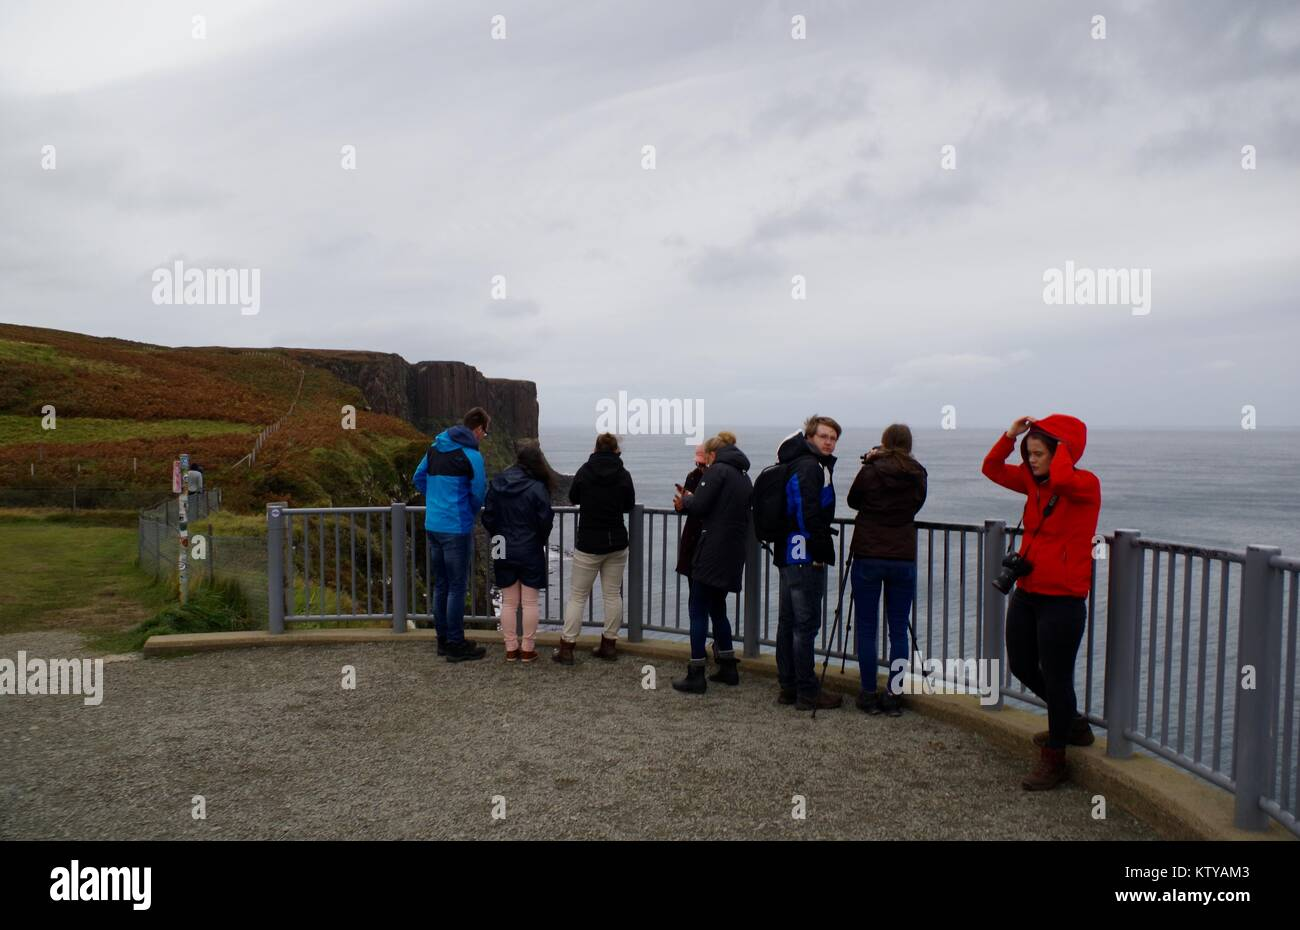 Tourists at the Viewing Platform, Kilt Rock and Mealt Falls, Isle of Skye, Scotland, UK. - Stock Image